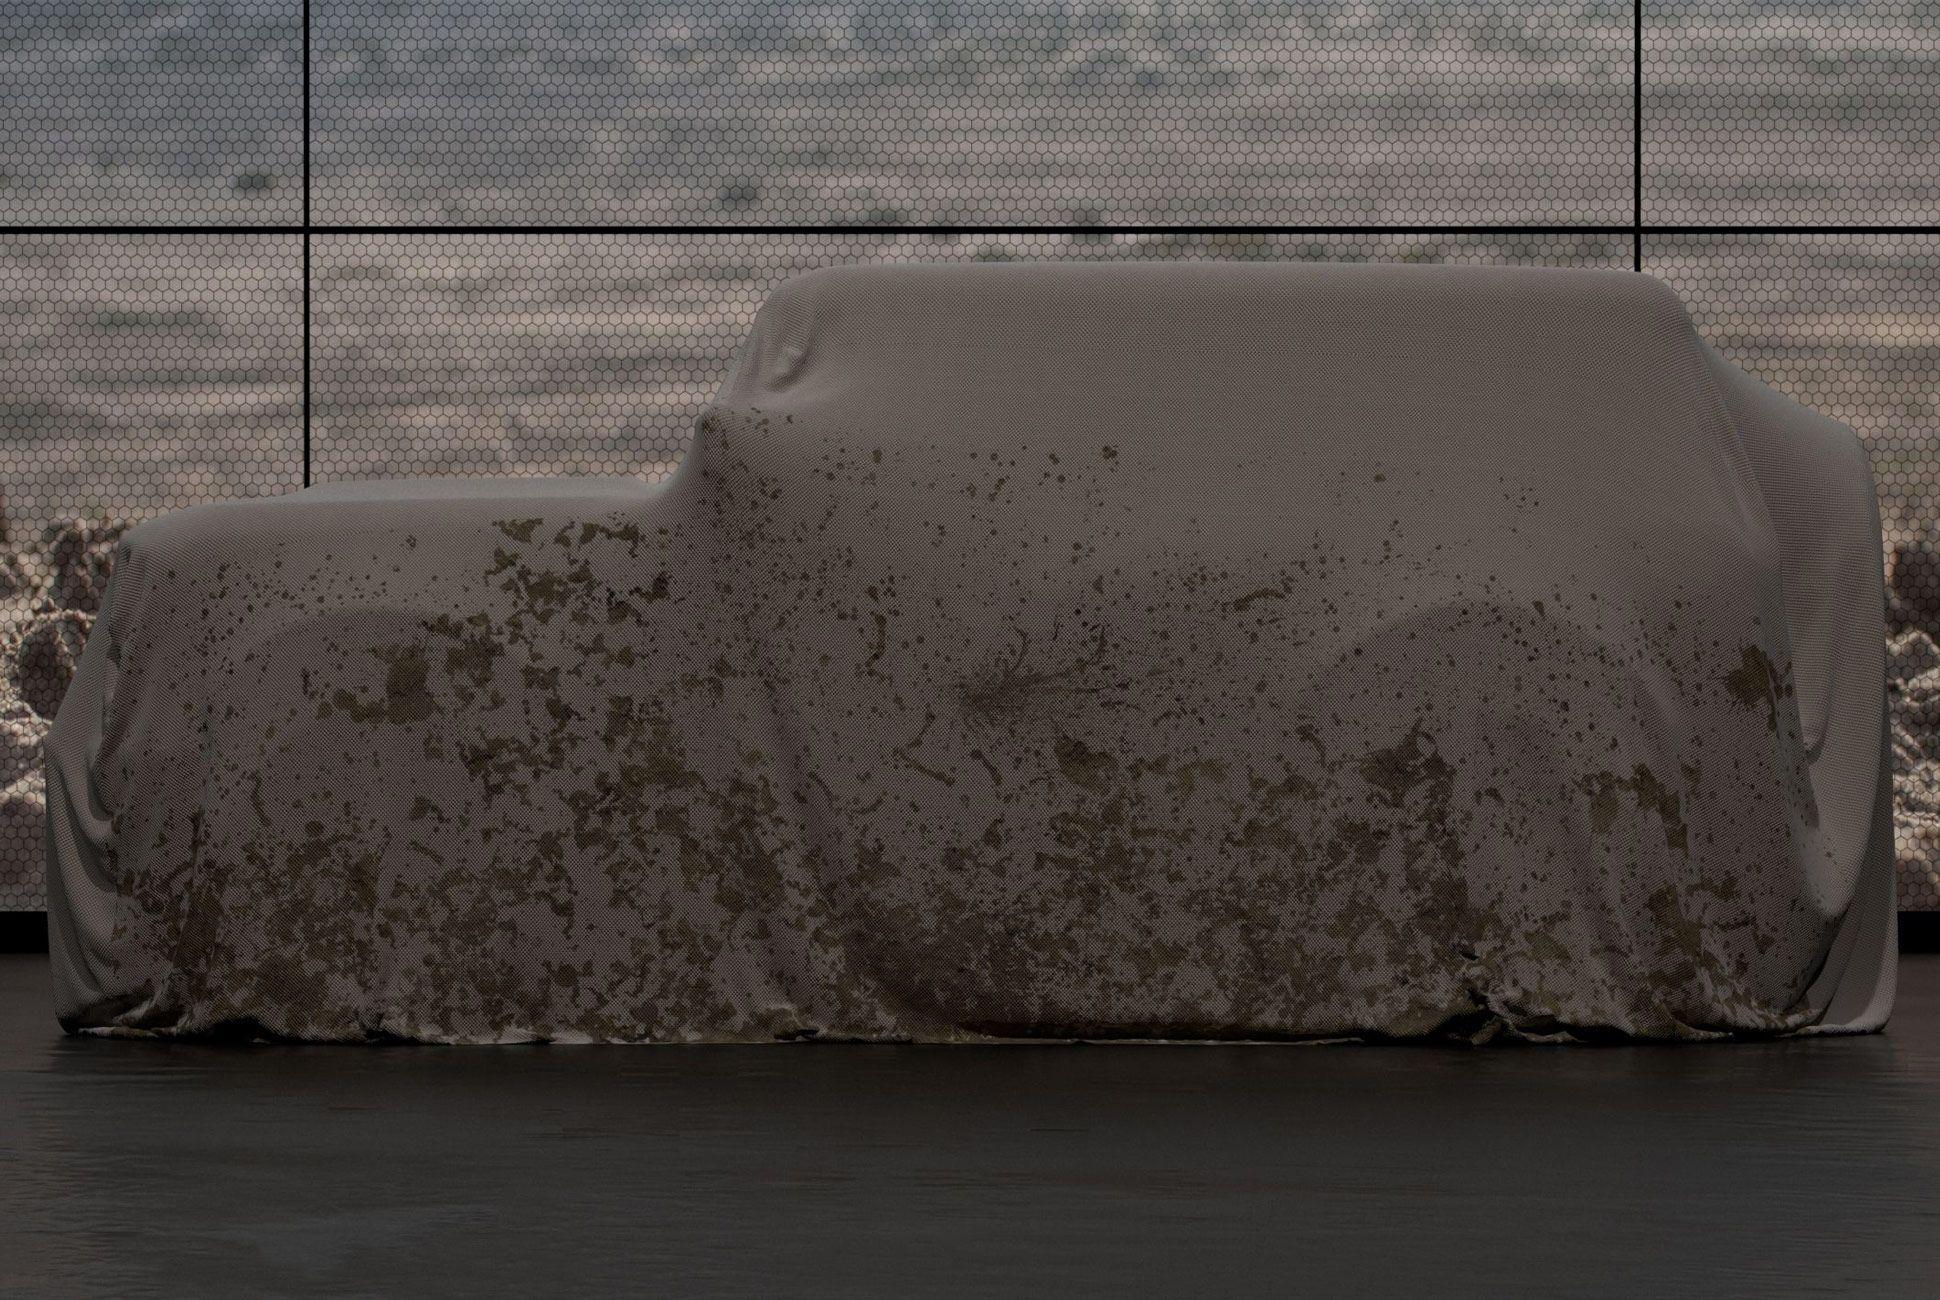 2020-Ford-Bronco-First-Look-gear-patrol-slide-1